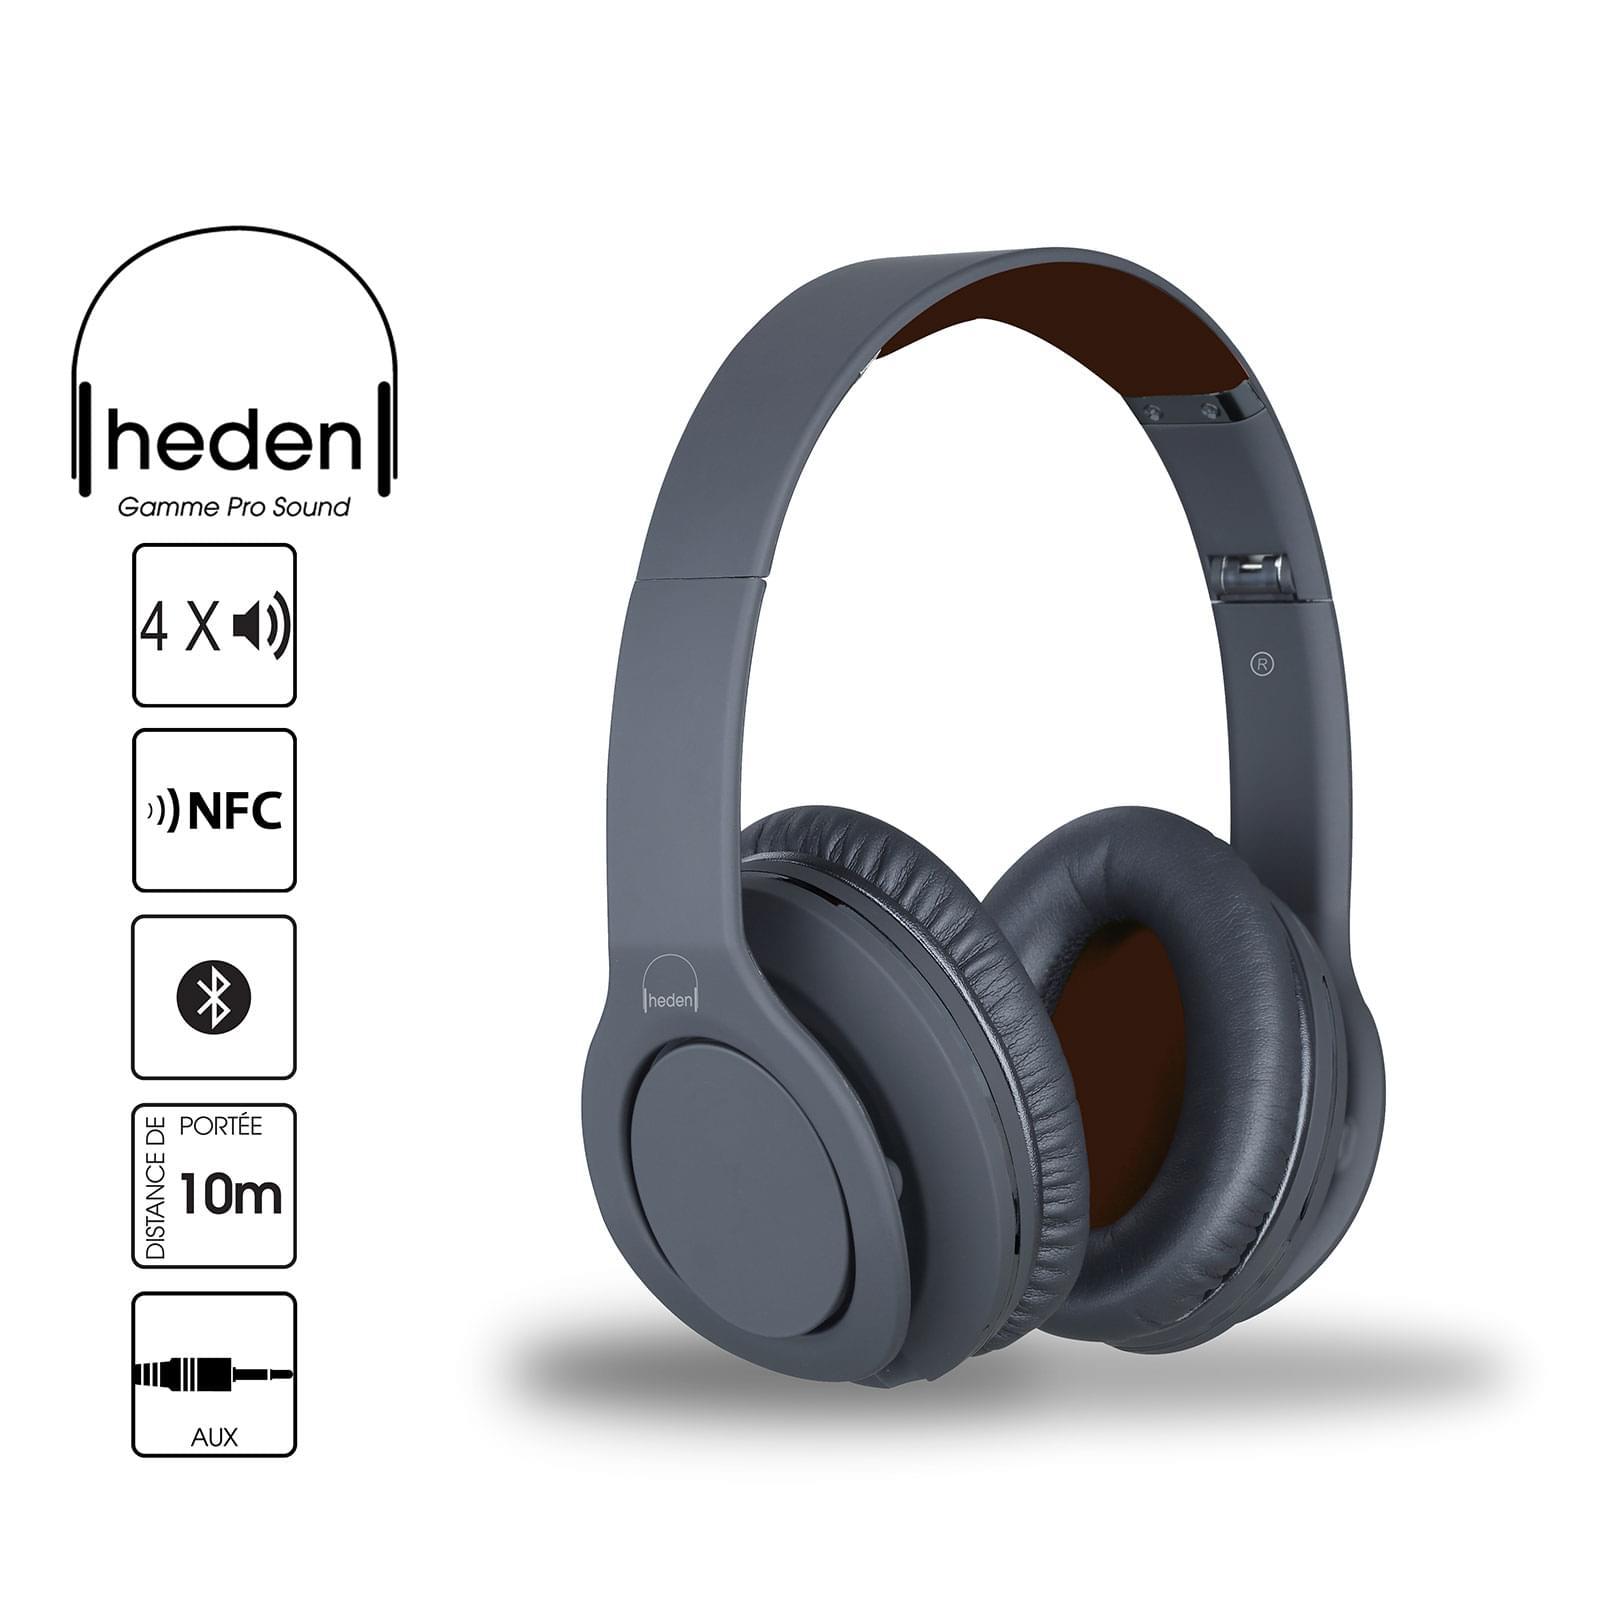 Heden PRO Sound Noir Stereo Gris - Micro-casque - Cybertek.fr - 0